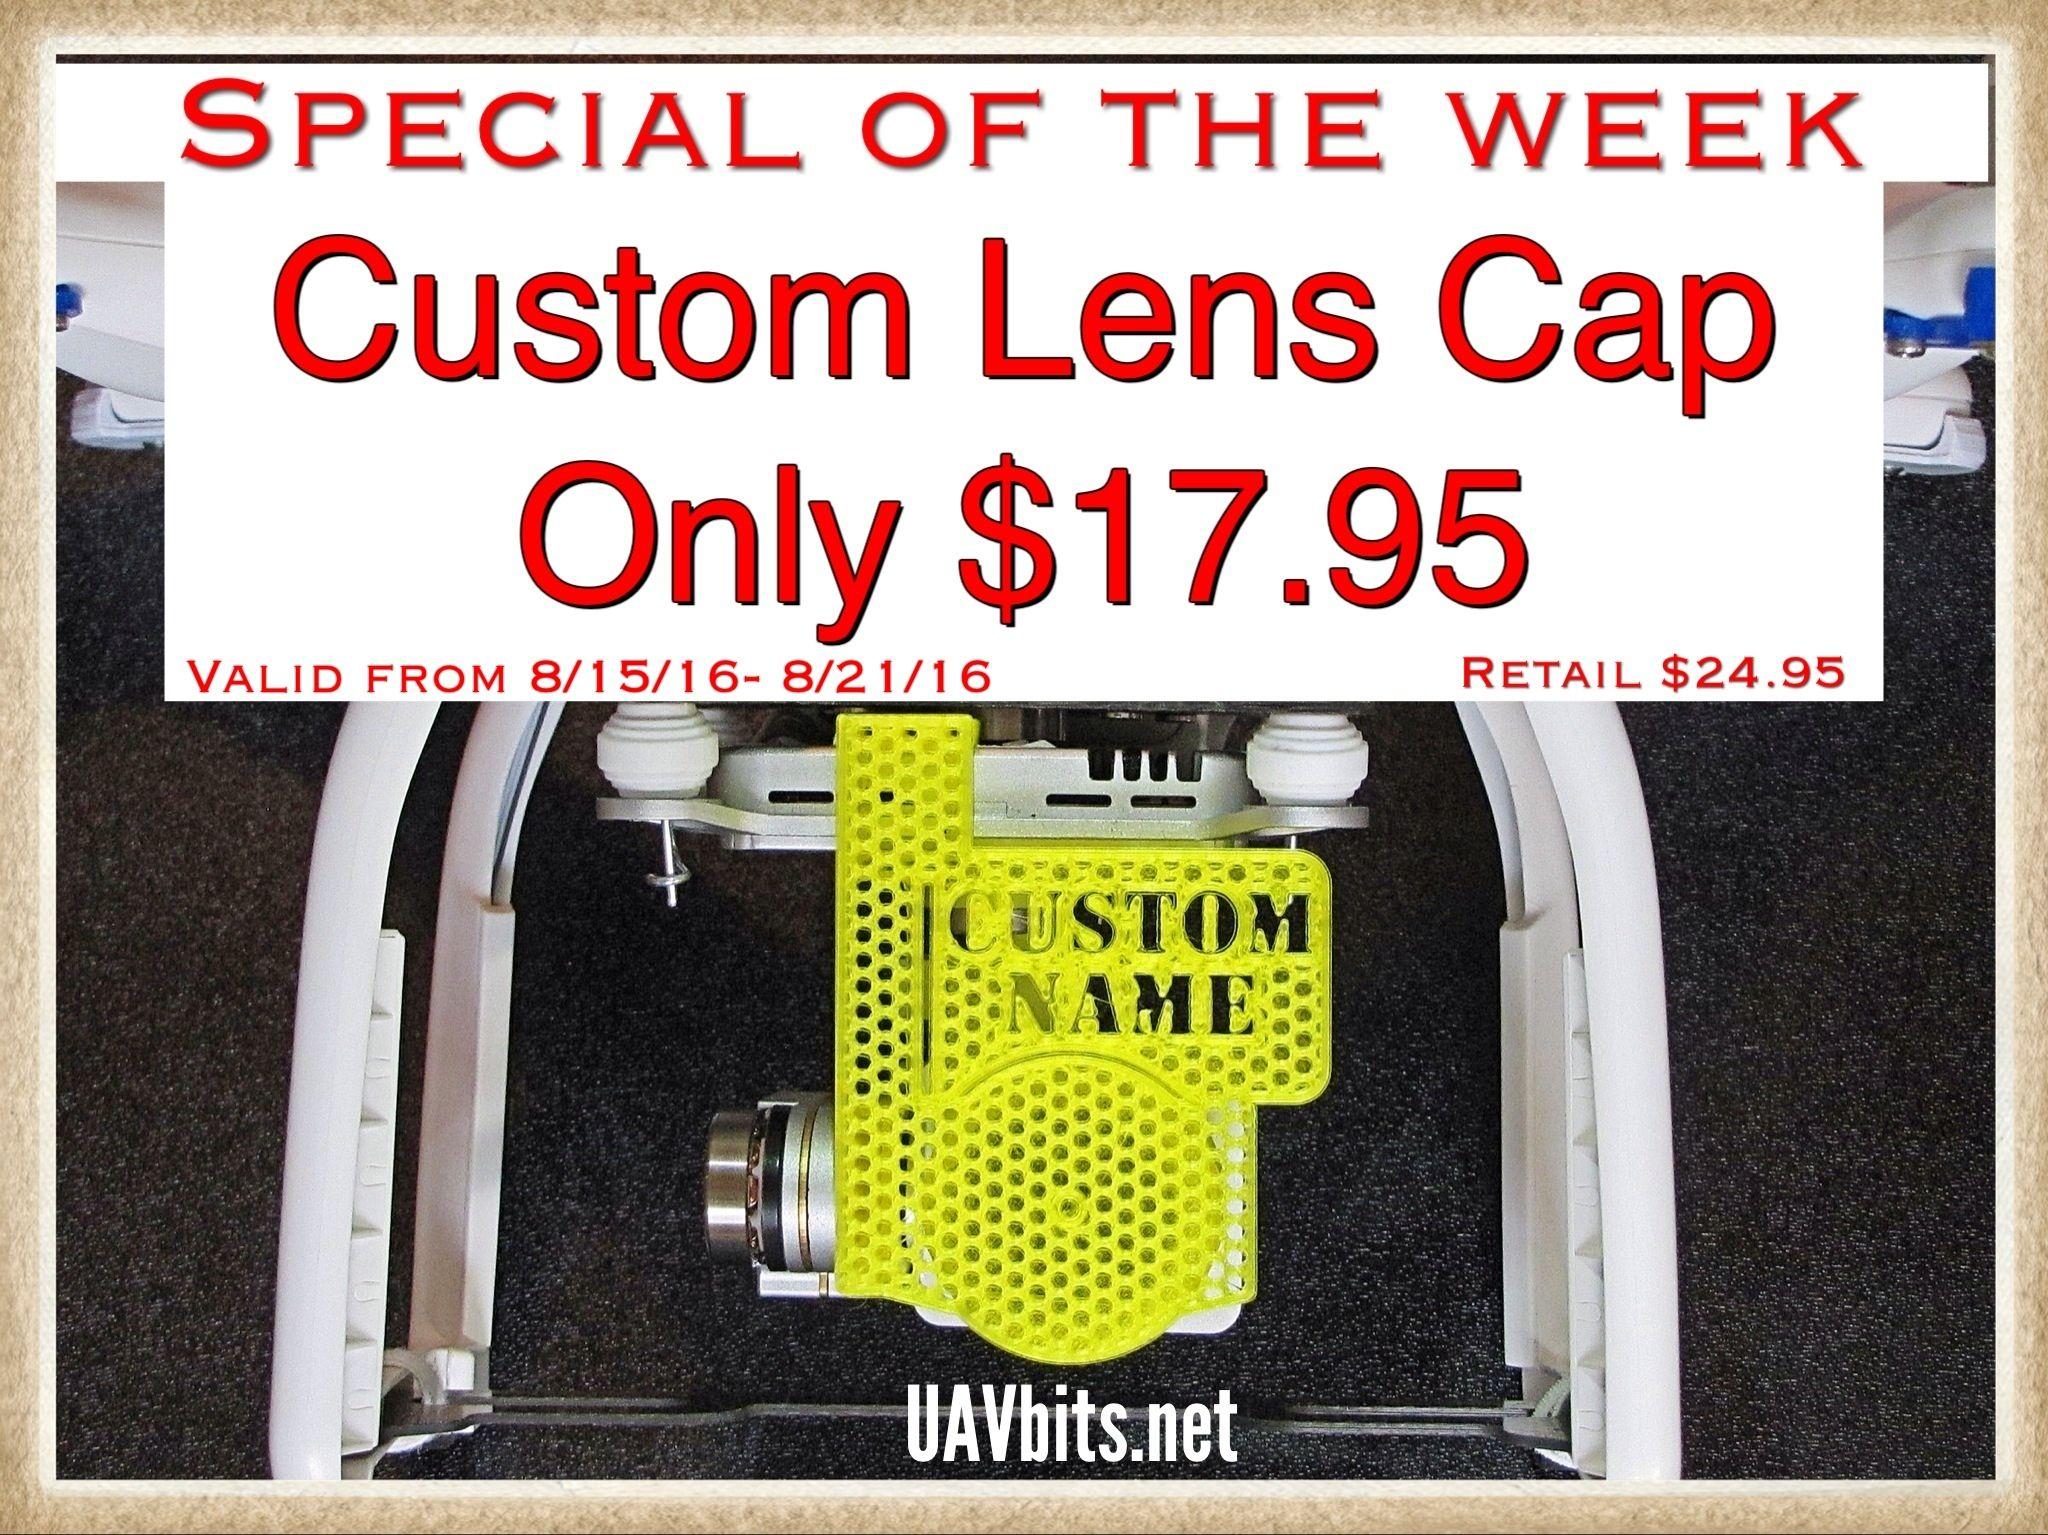 uavbits.net #custom #lenscap for your #P3 #DJI #djiphantom #uav Several colors to choose from